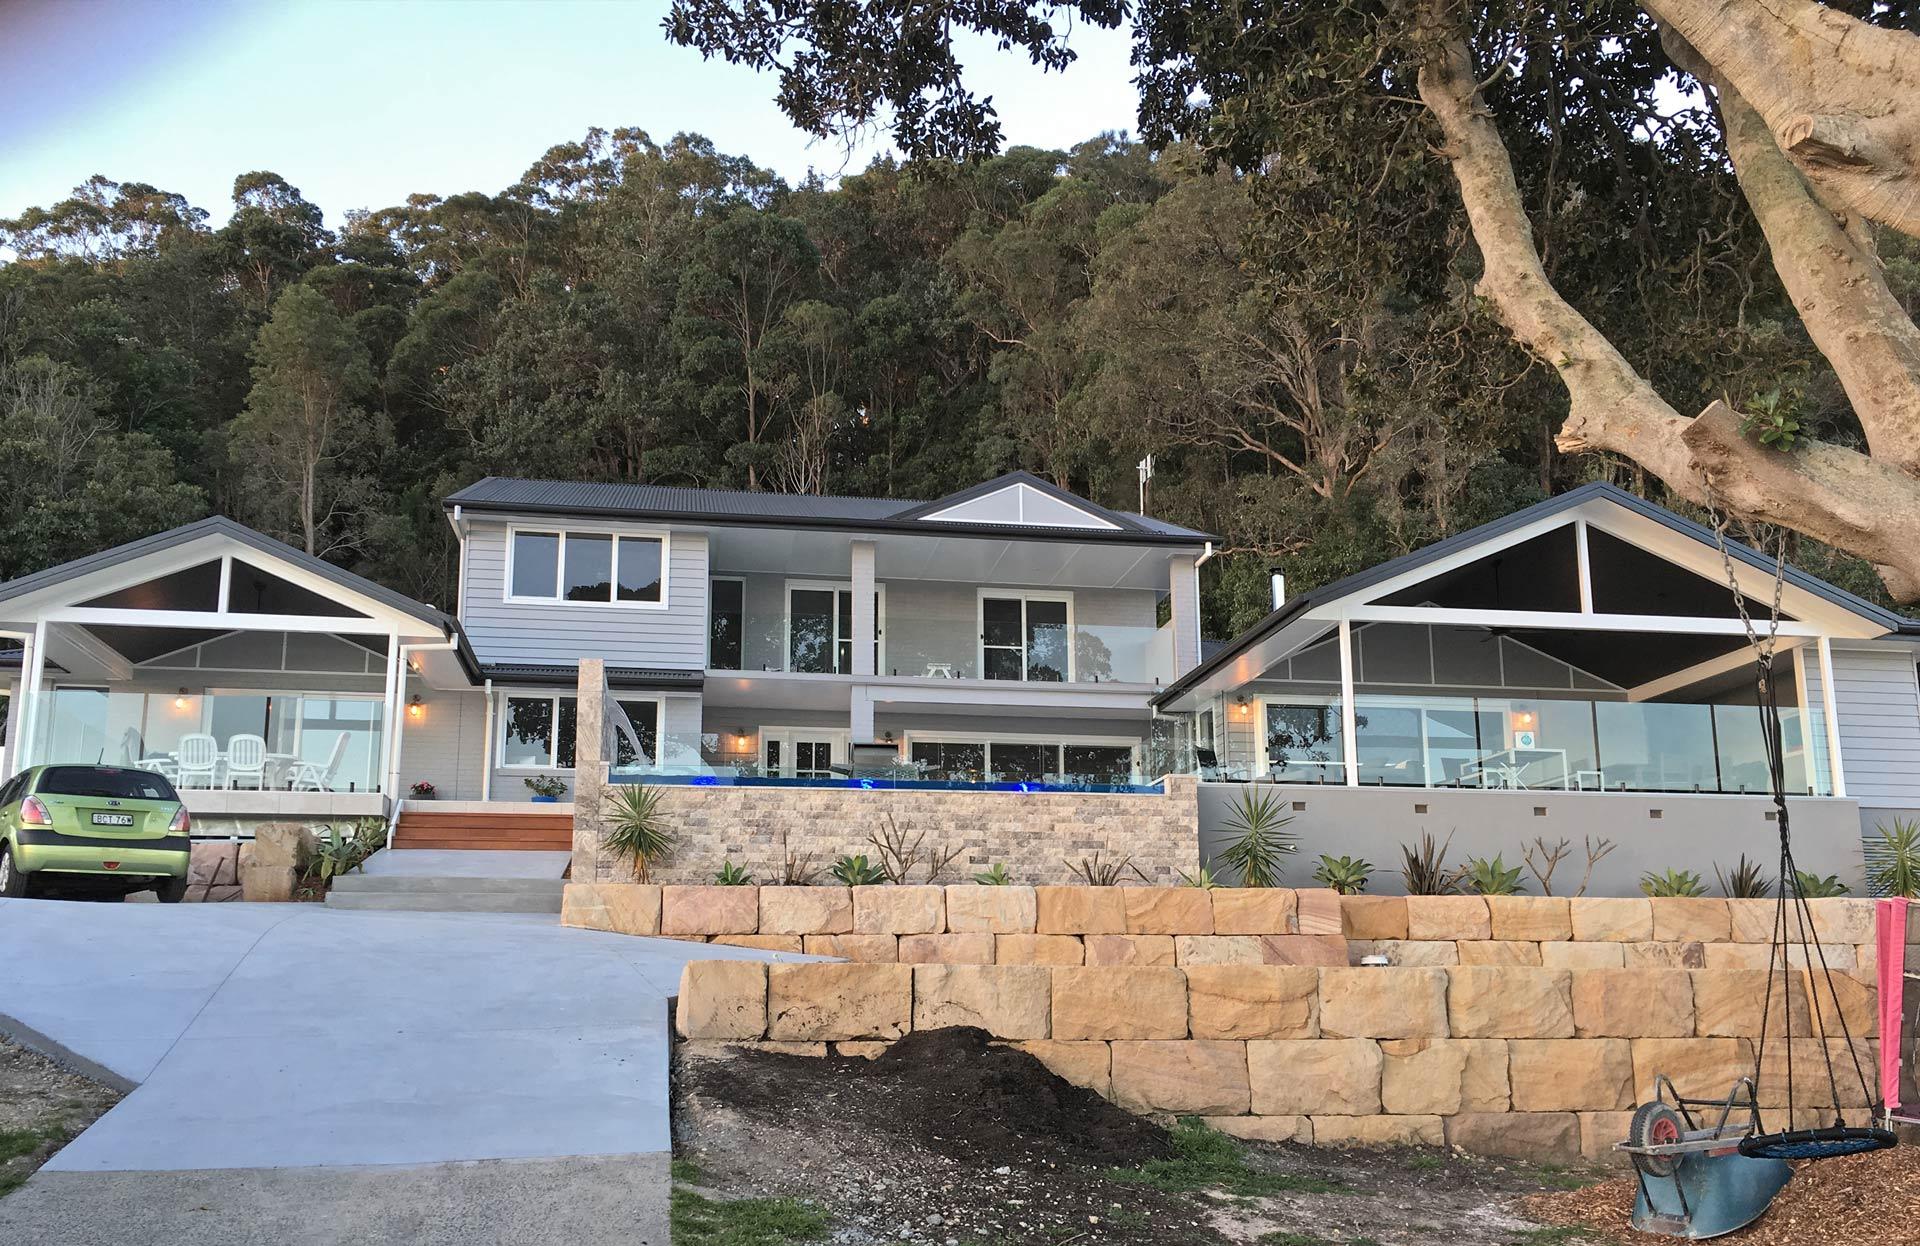 Etchells Building Design - Residential Building Design Service Central Coast